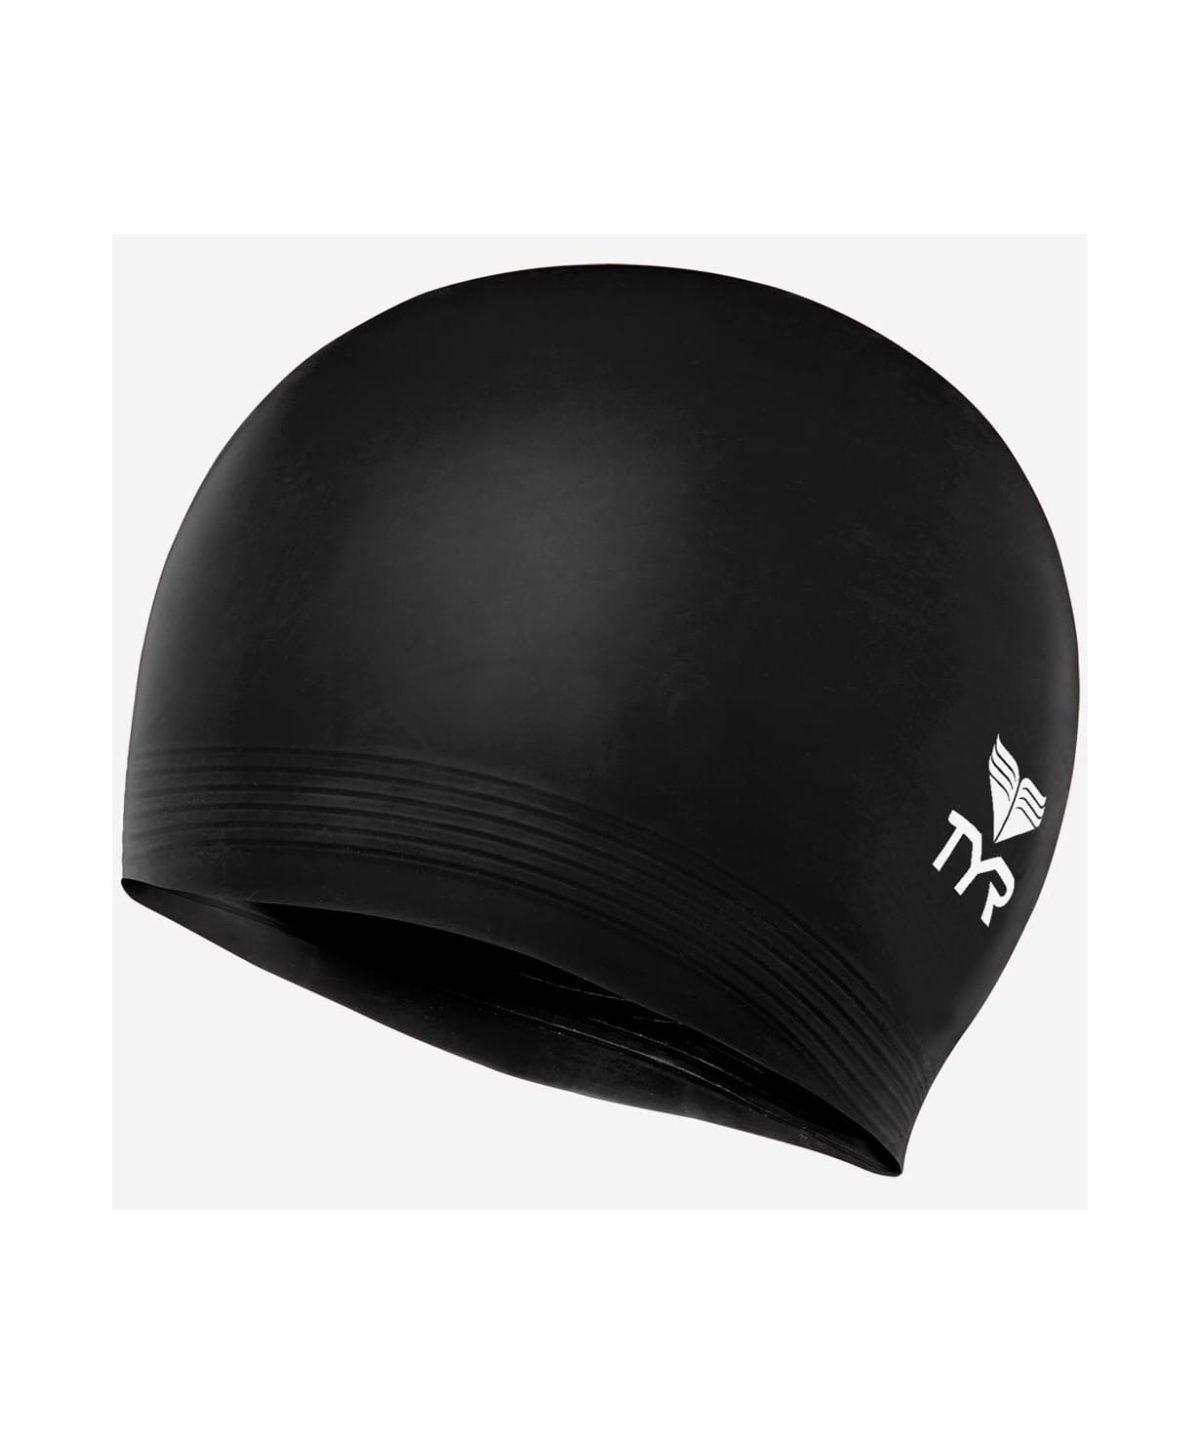 TYR Latex Swim Cap Шапочка для плавания латекс  LCL: чёрный - 1